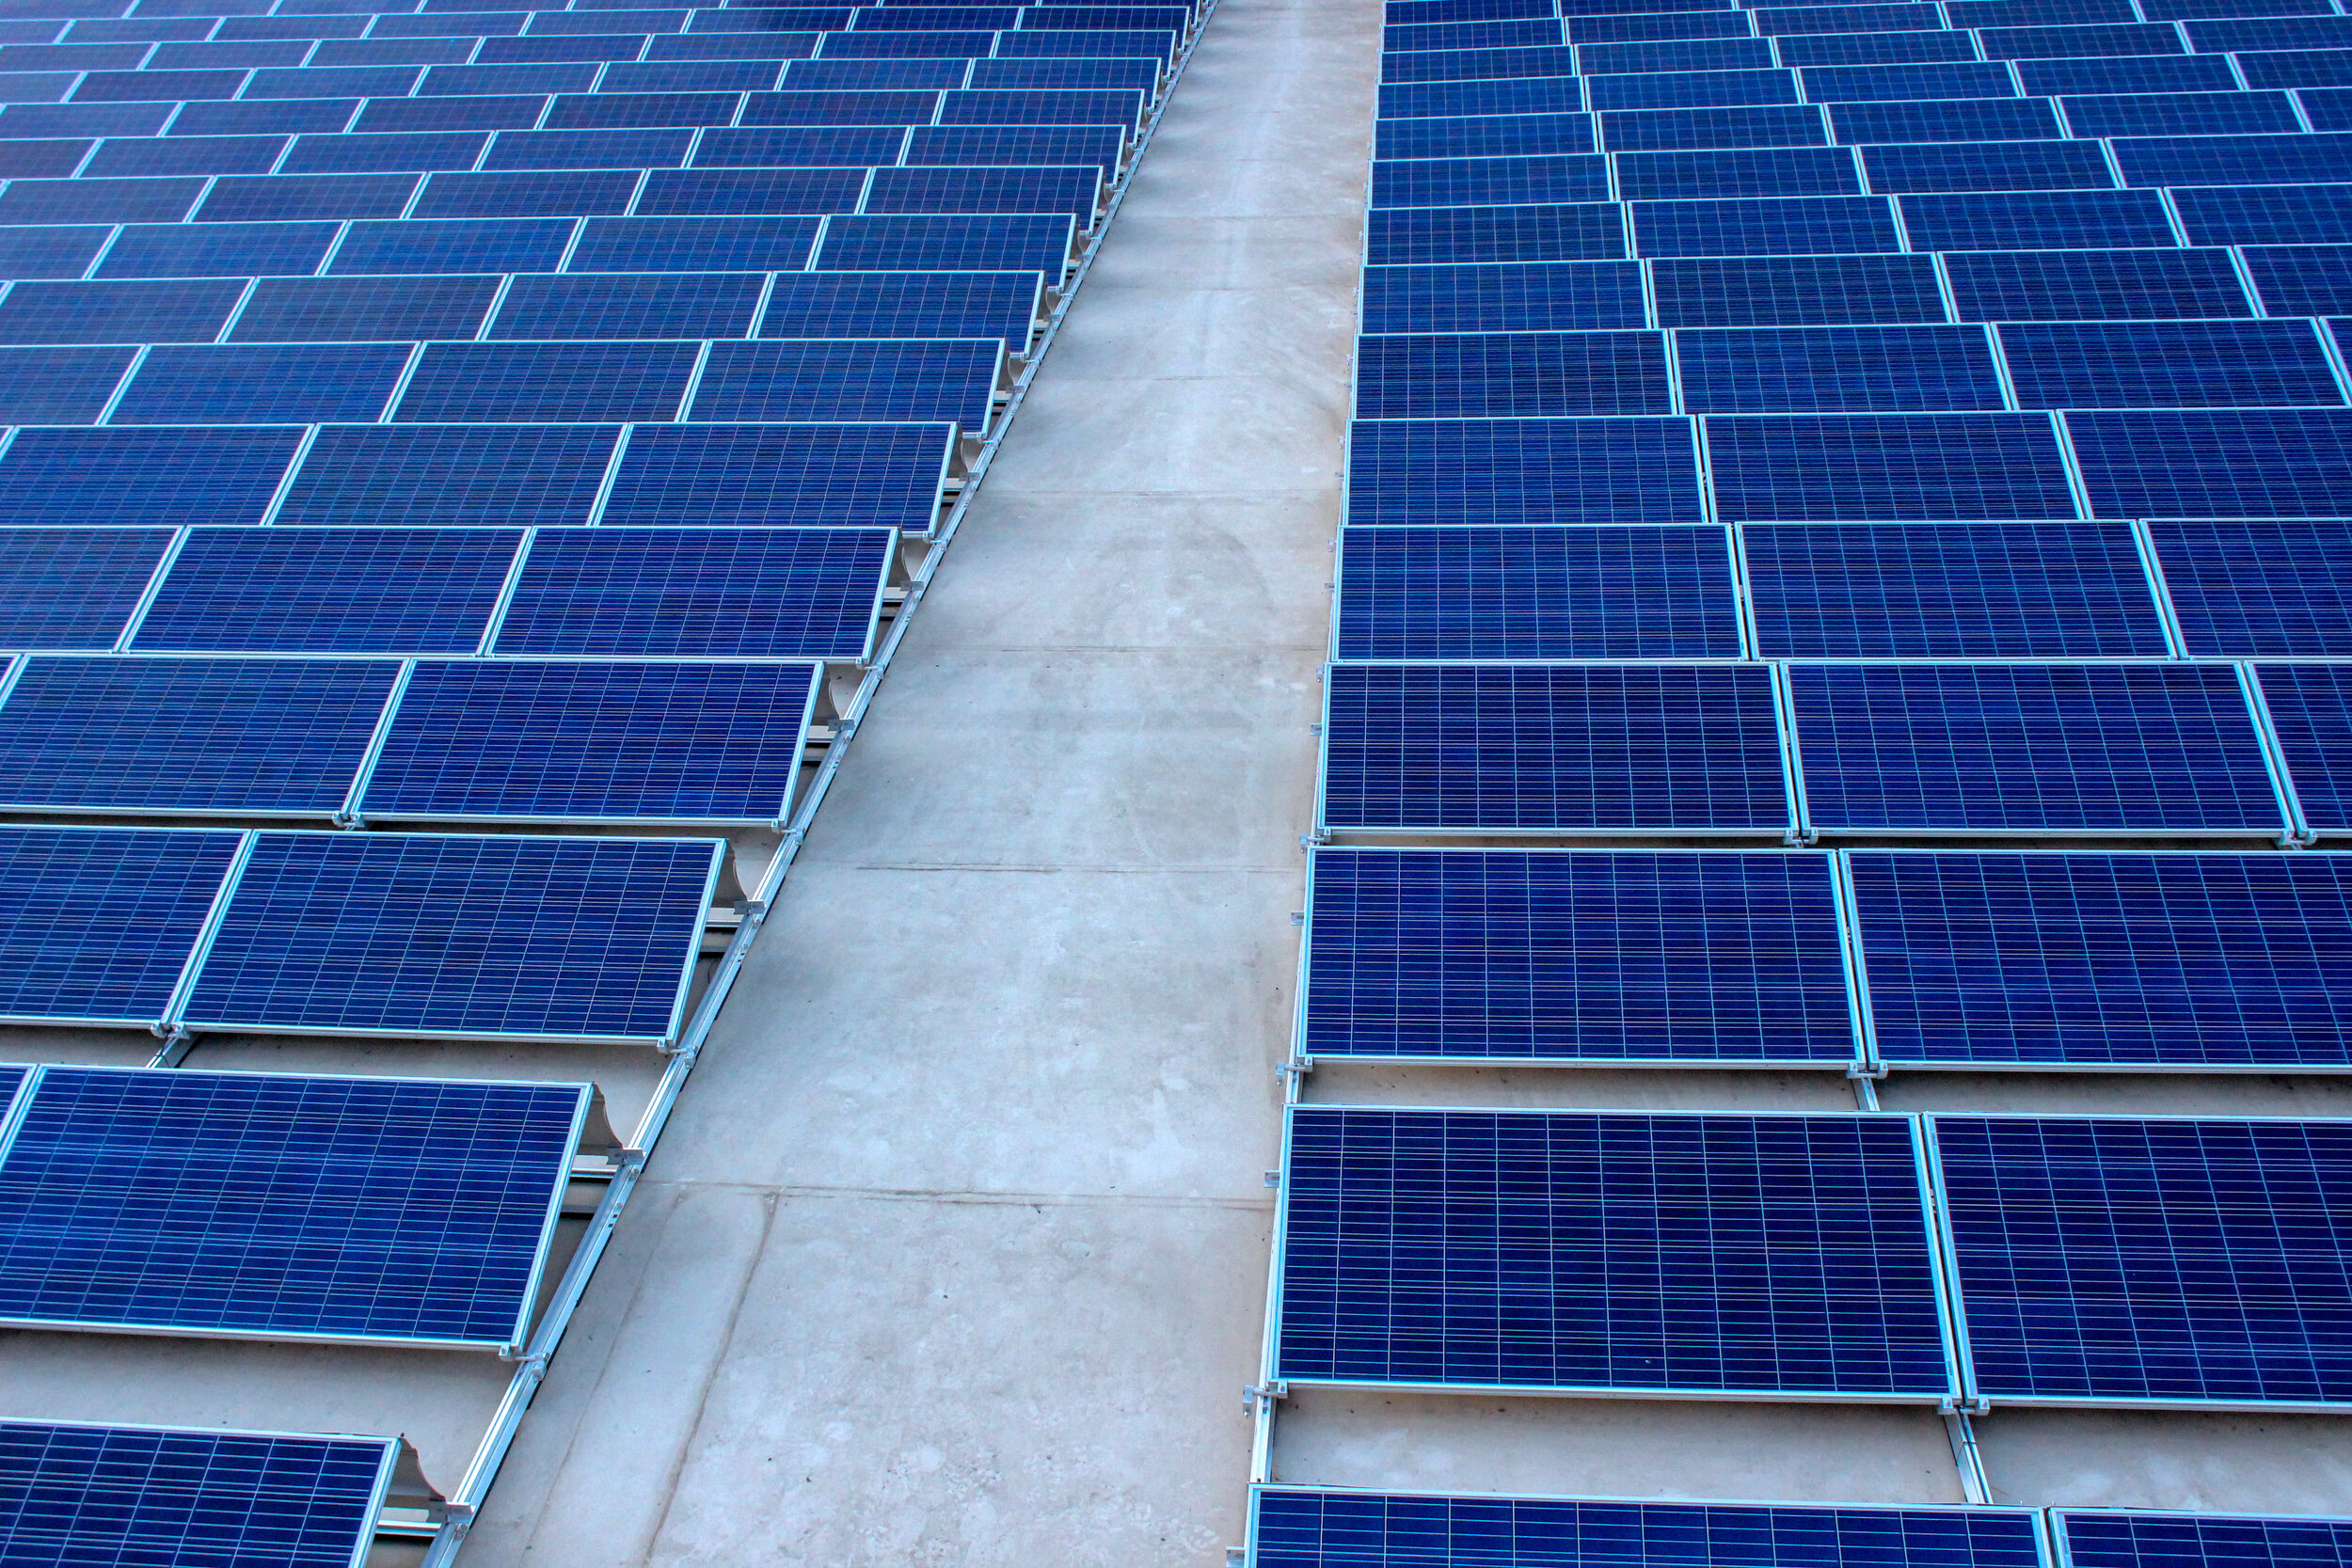 Solar Saturation, AKA Over Voltage — GOLIATH SOLAR & ELECTRICAL